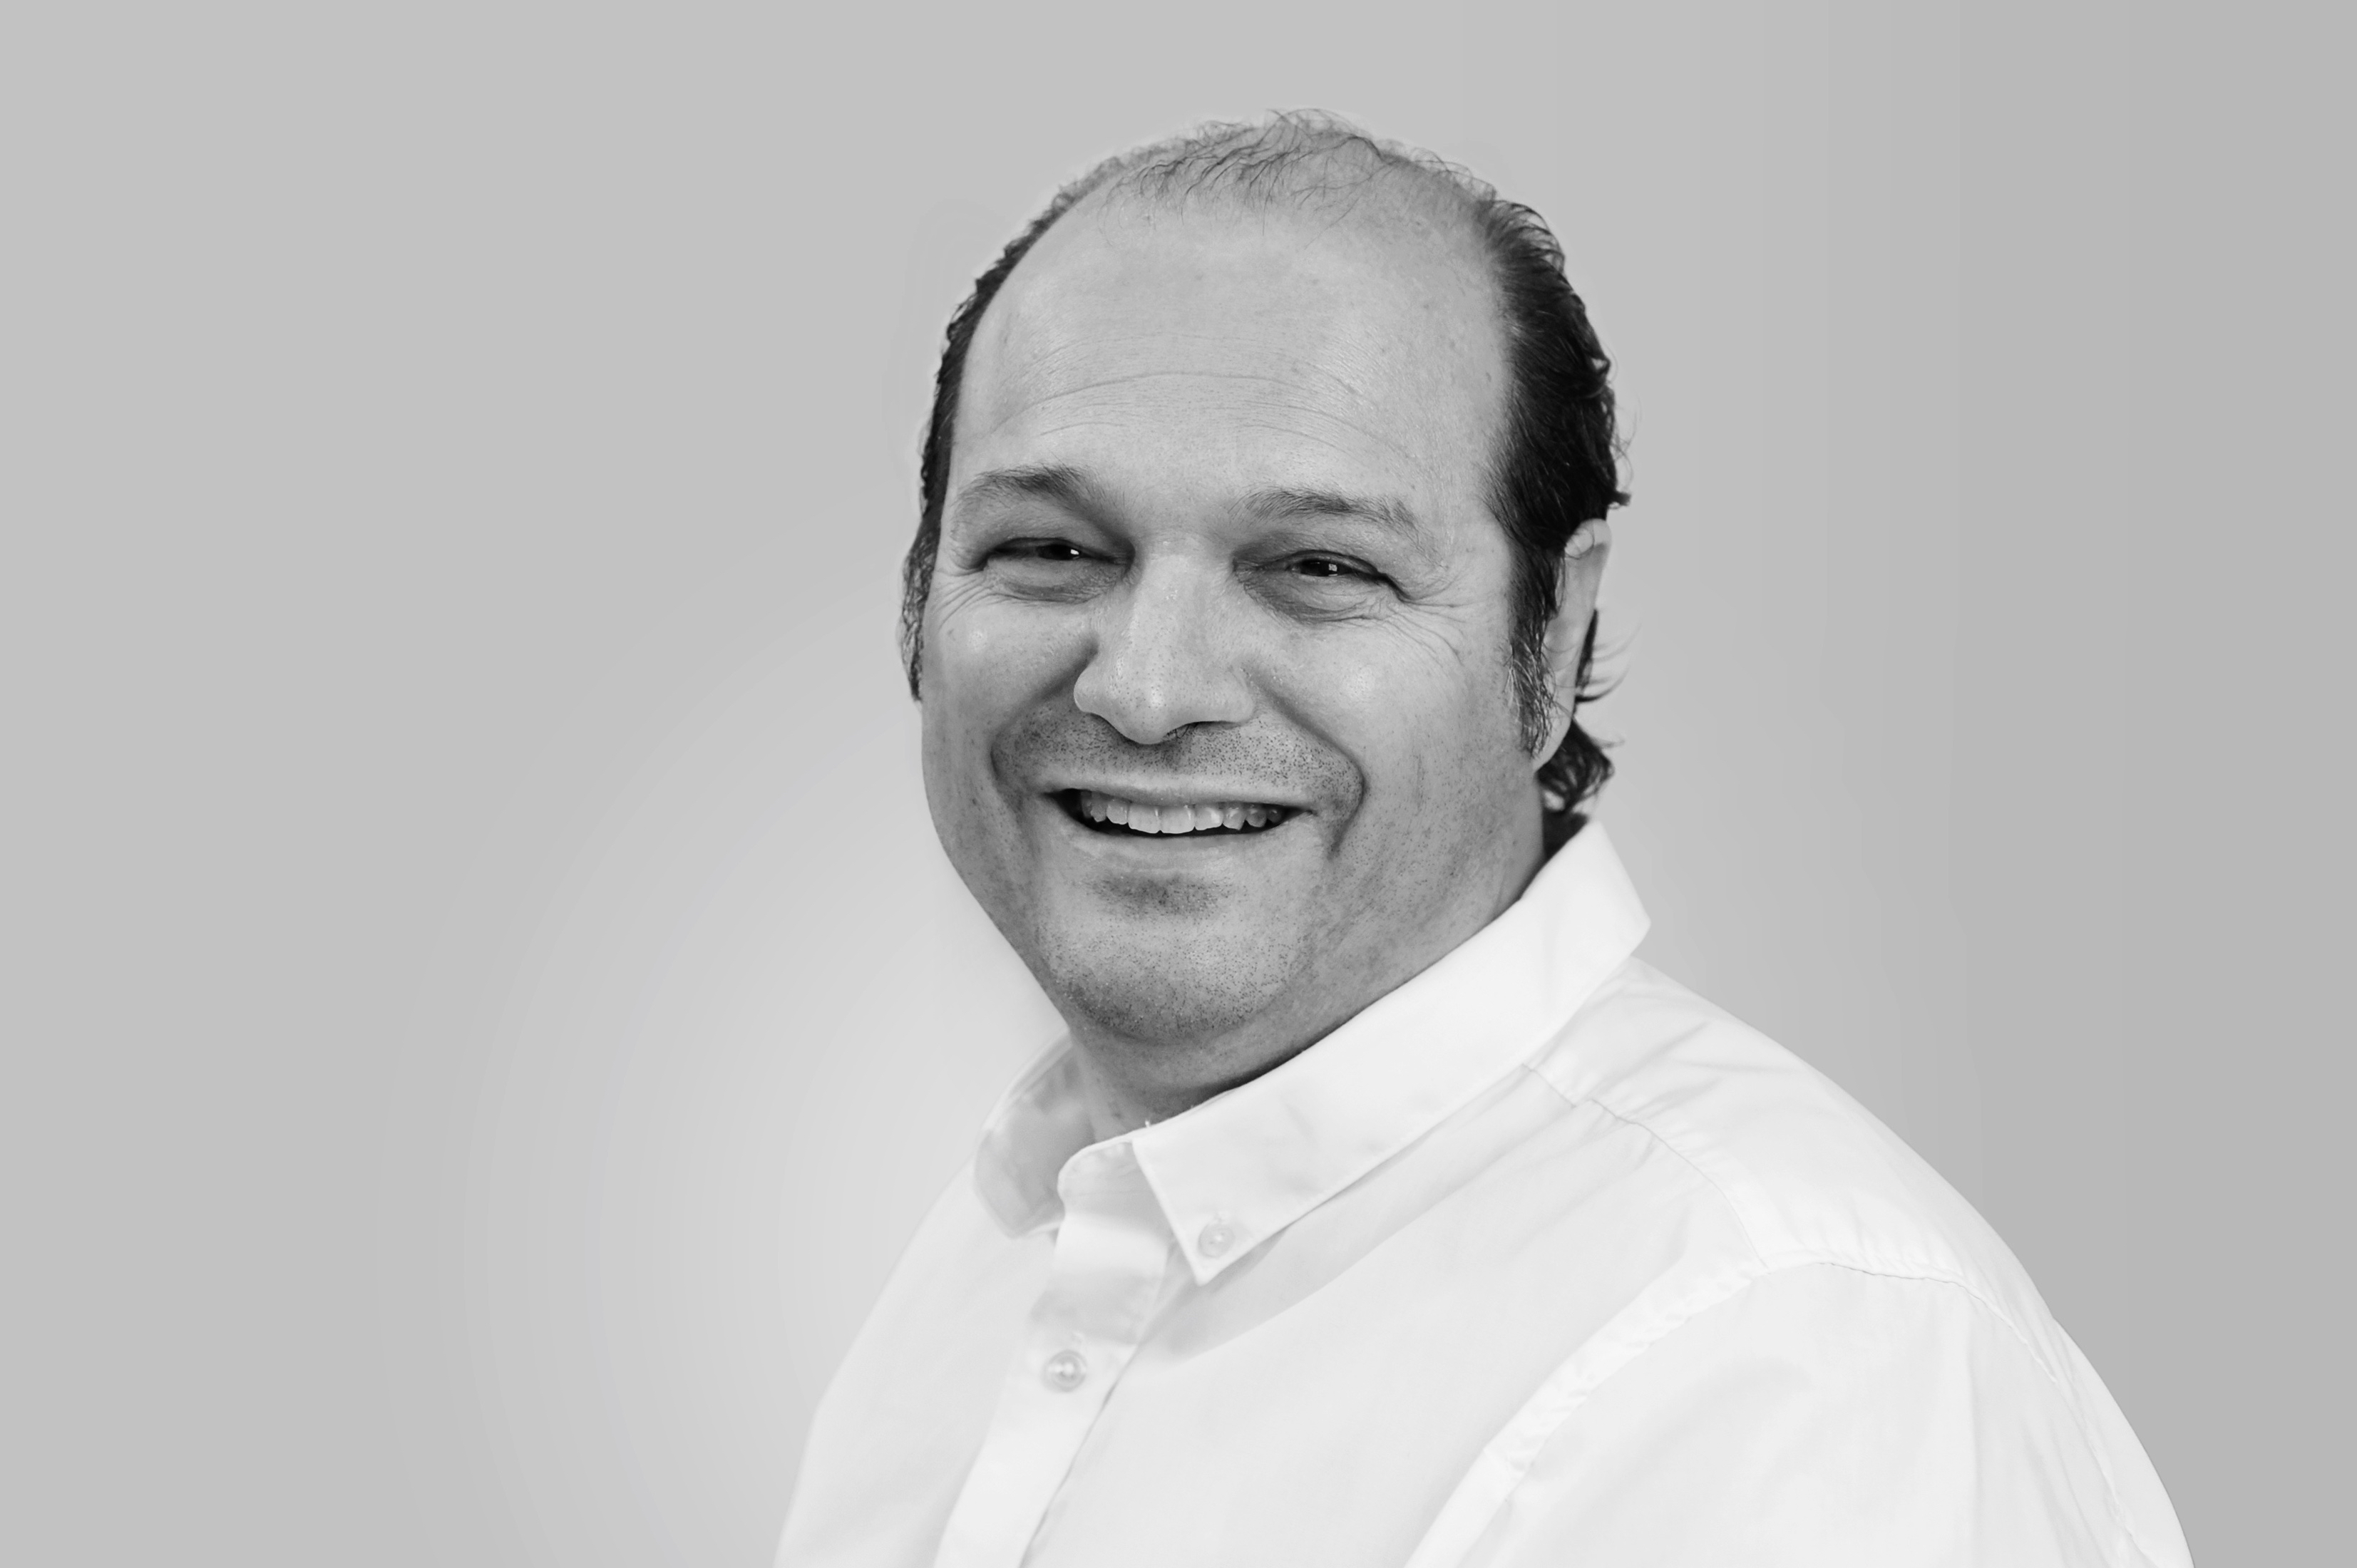 ZTM Alberto Pasquali